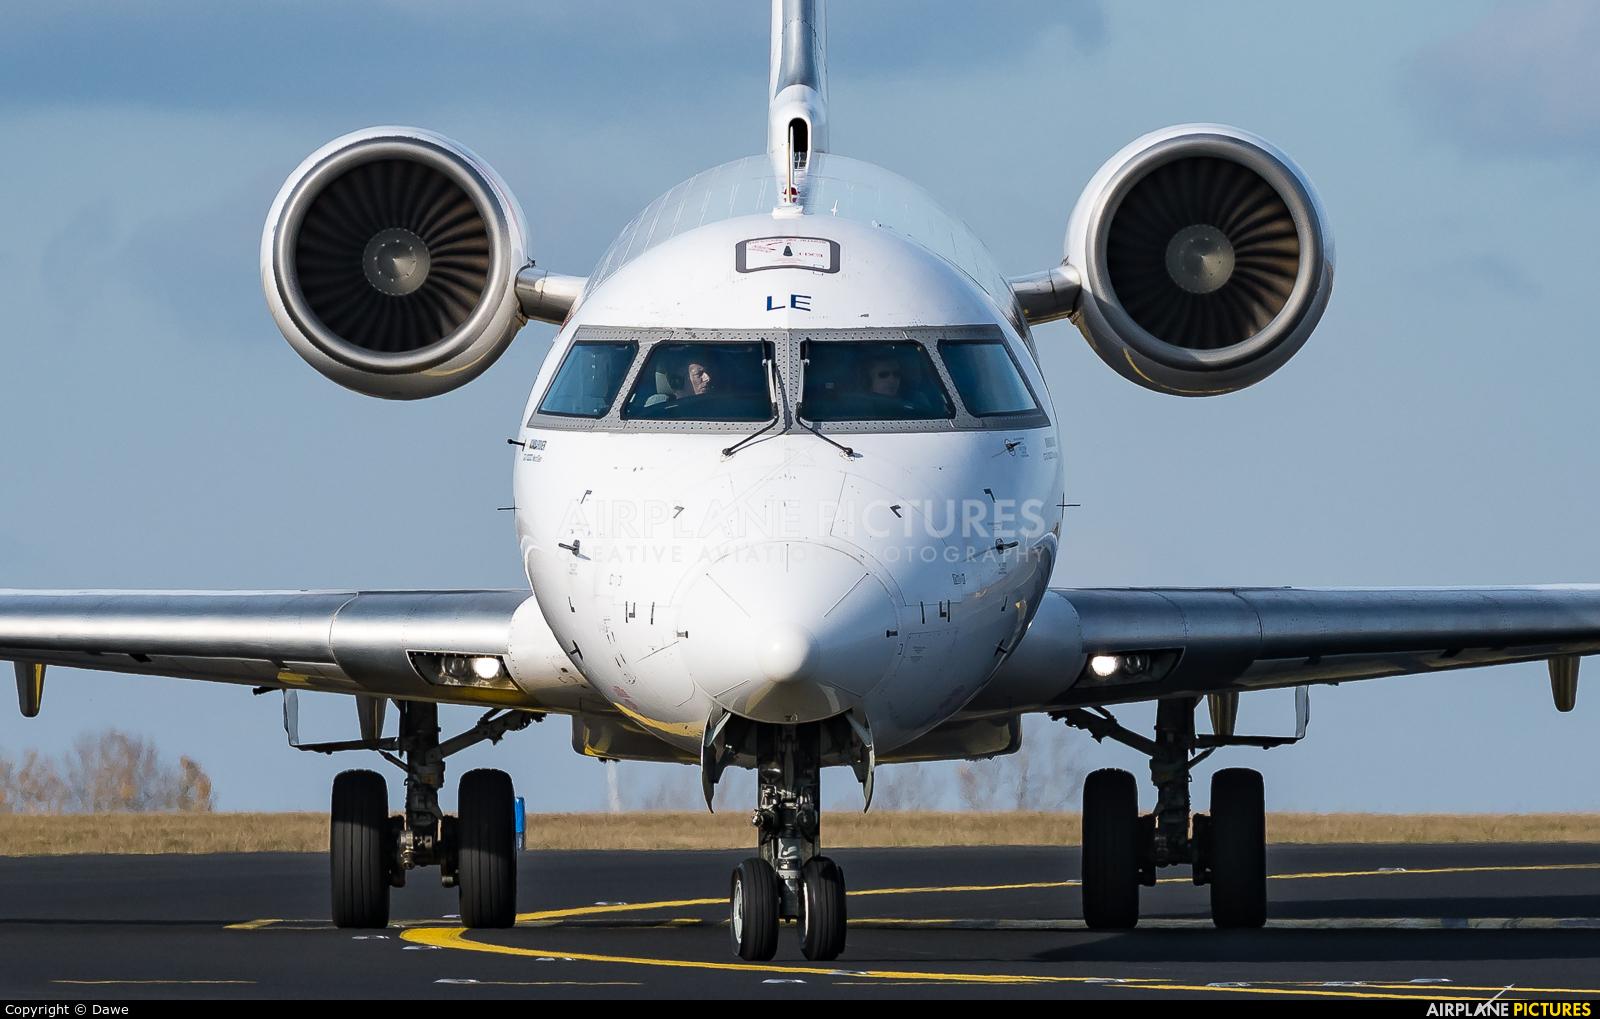 Air France - Hop! F-HMLE aircraft at Prague - Václav Havel